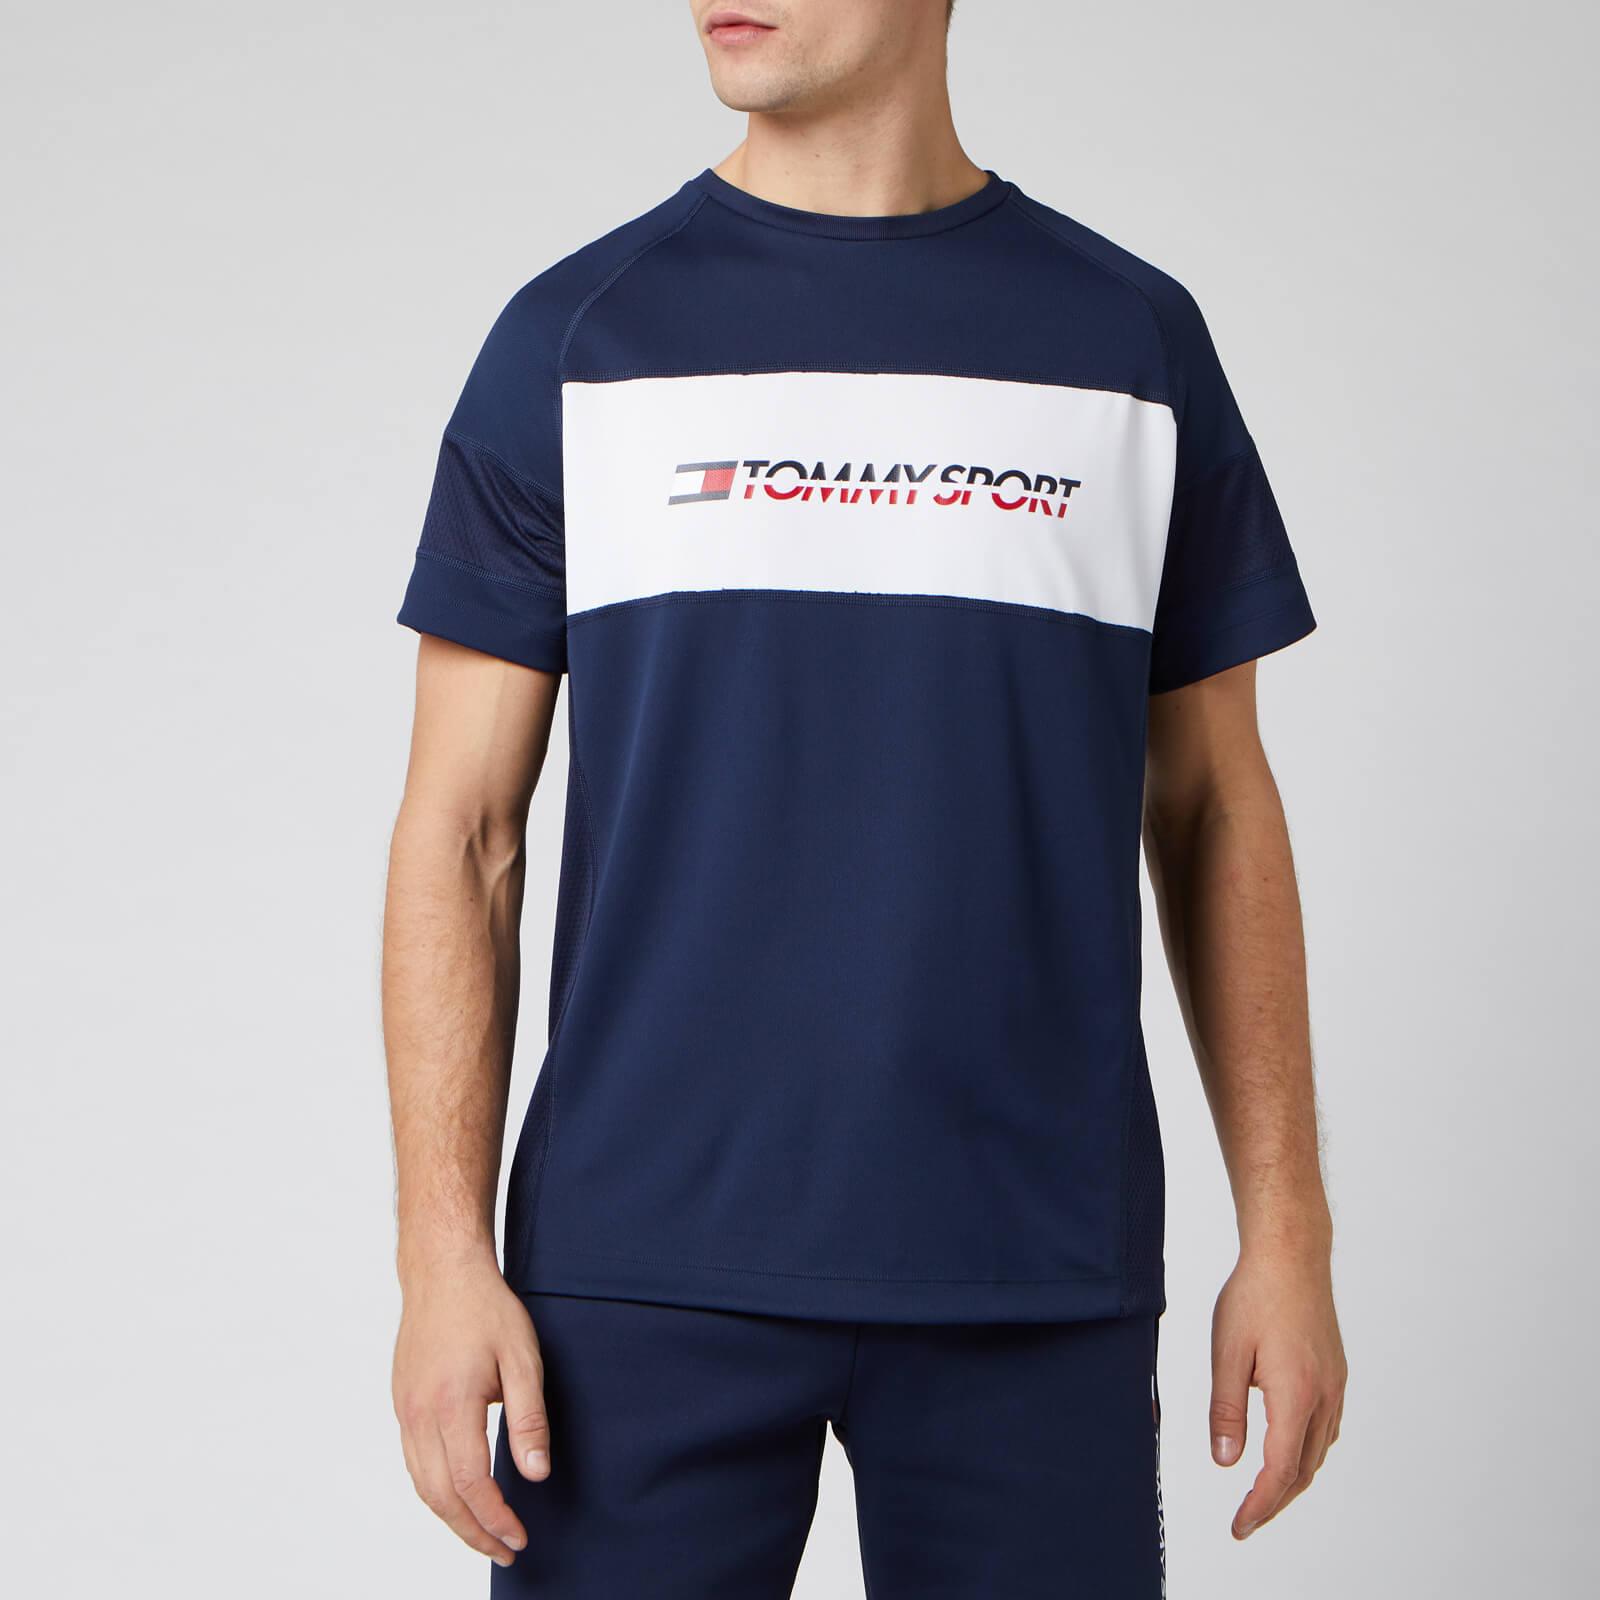 Tommy Sport Men's Performance Mesh Short Sleeve T-Shirt - Sport Navy - S